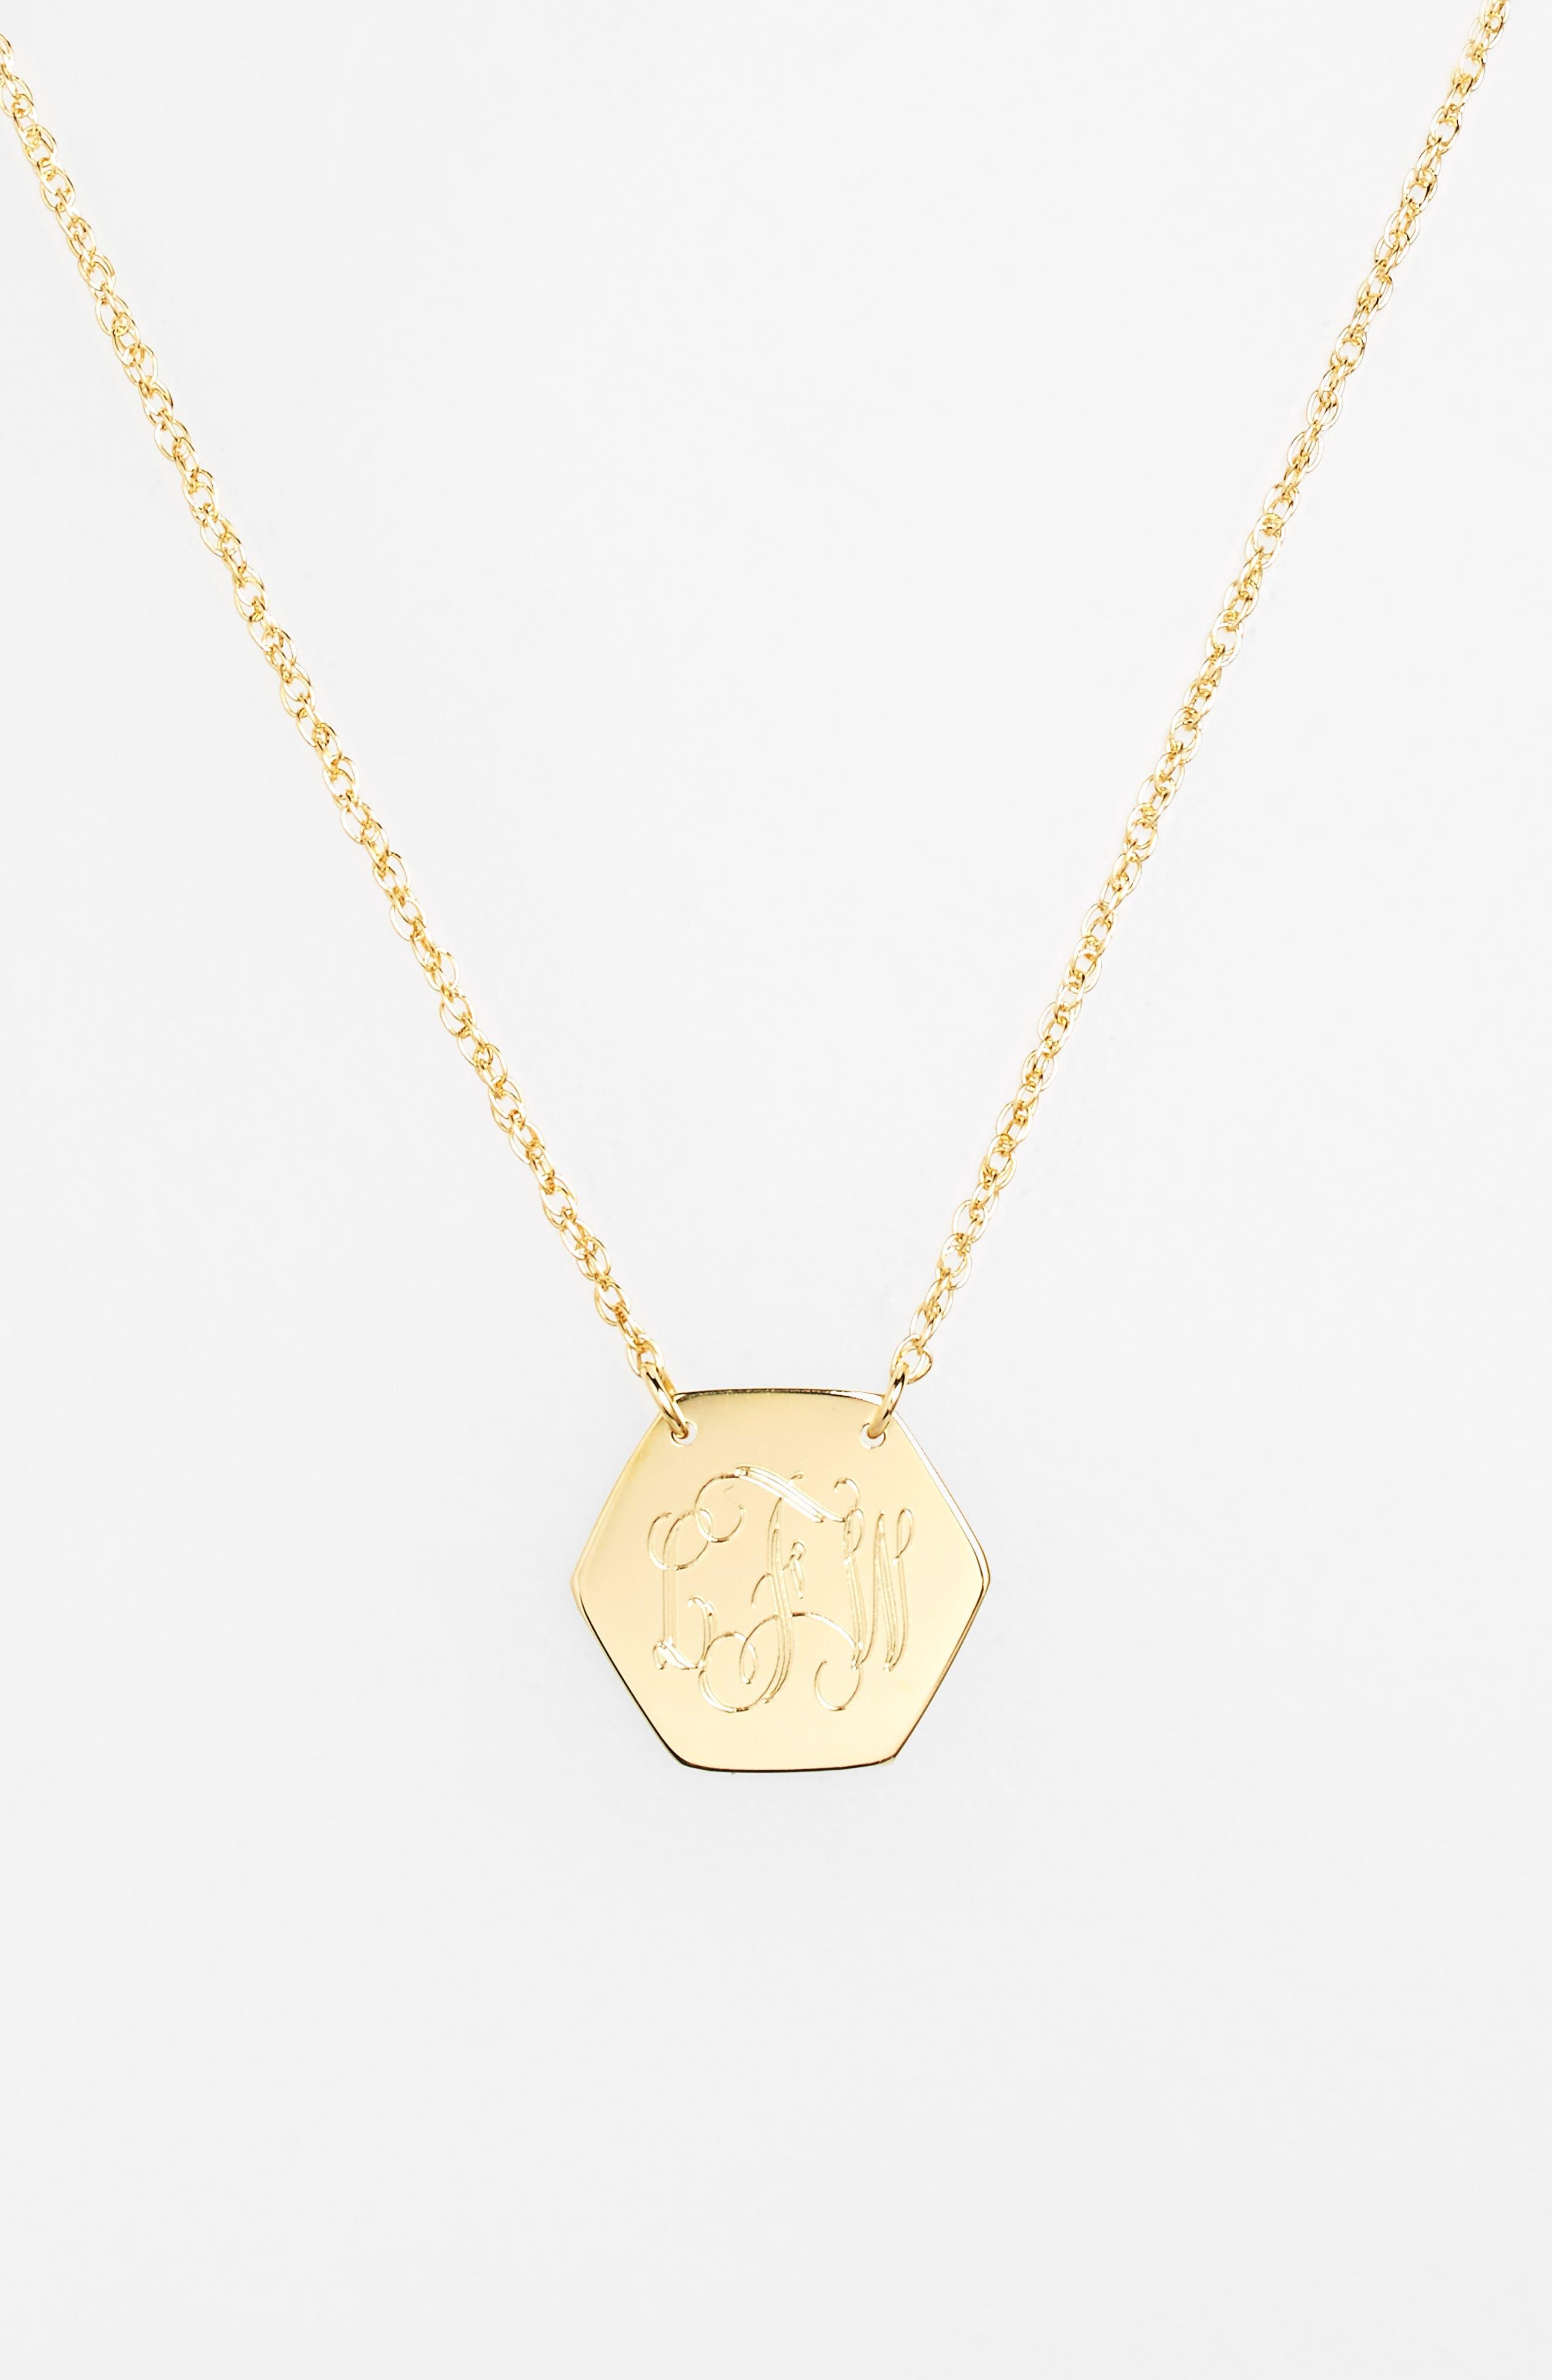 Personalized Hexagon Pendant Necklace,                             Alternate thumbnail 3, color,                             GOLD